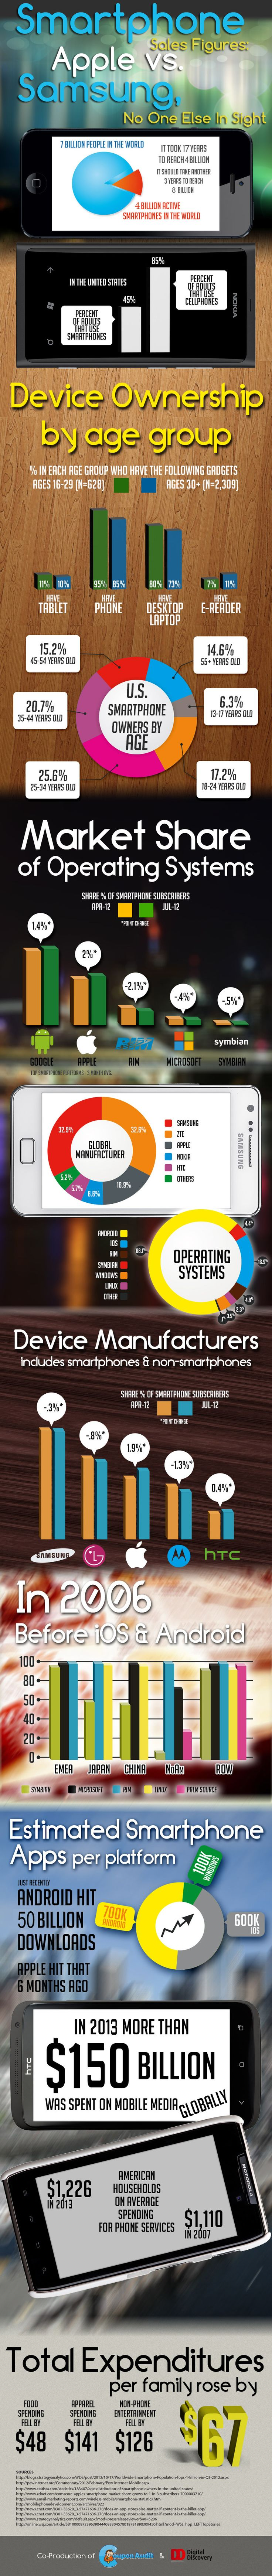 Smartphone-Sales-Figures-Apple-vs-Samsung-No-One-Else-In-Sight